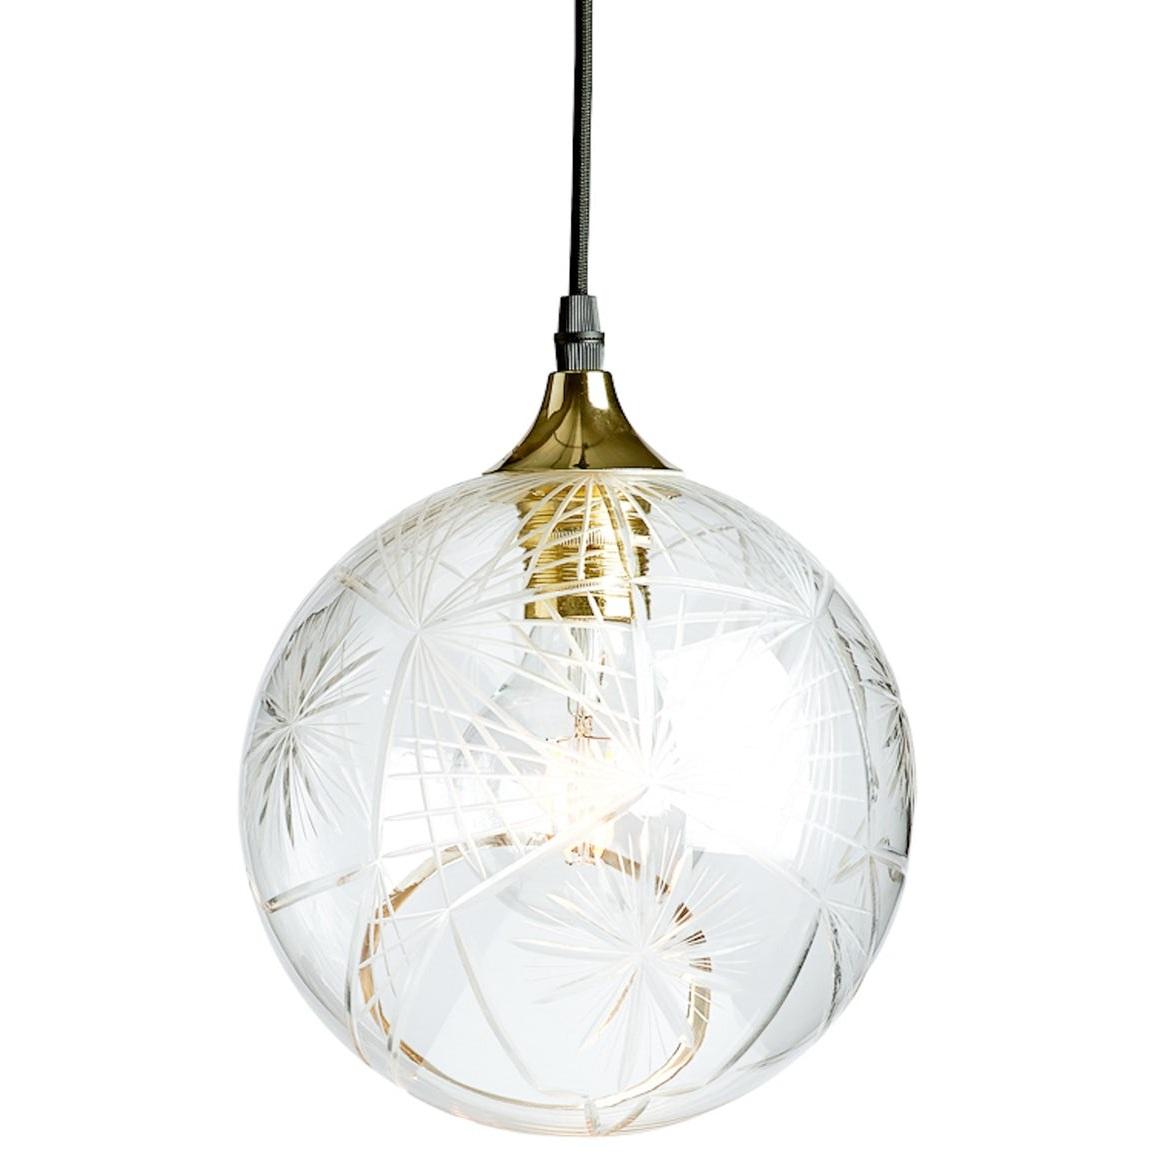 marie.burgos.design.ballroom.diamond.cut.pendant.lighting.lighting.pendants.glass.1506707657700.jpg